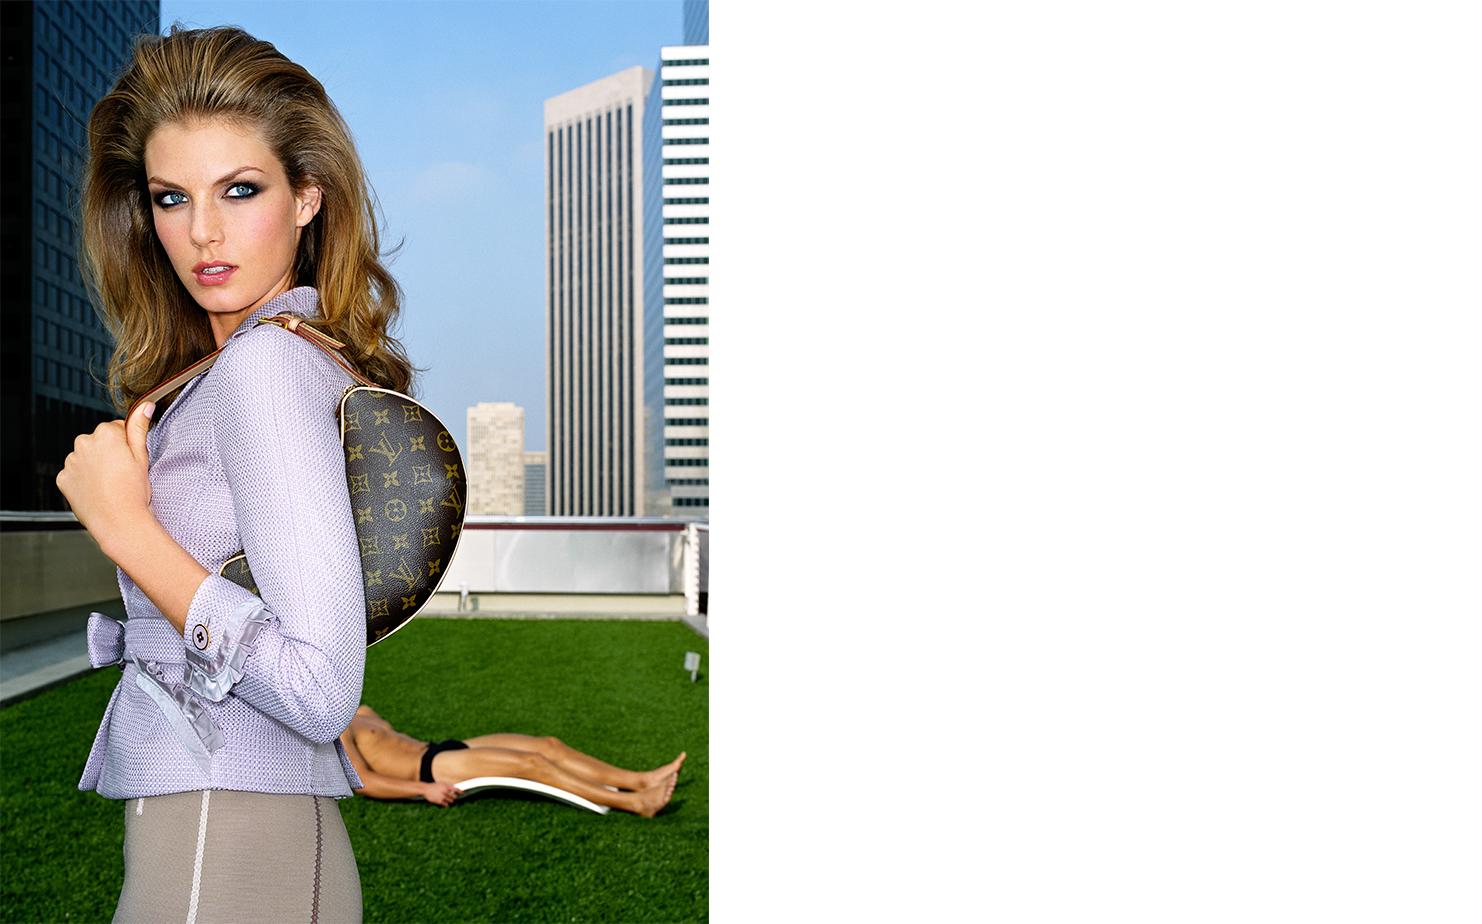 Louis Vuitton   AGENCY Betc CREATIVE DIRECTOR Bernard Guillon